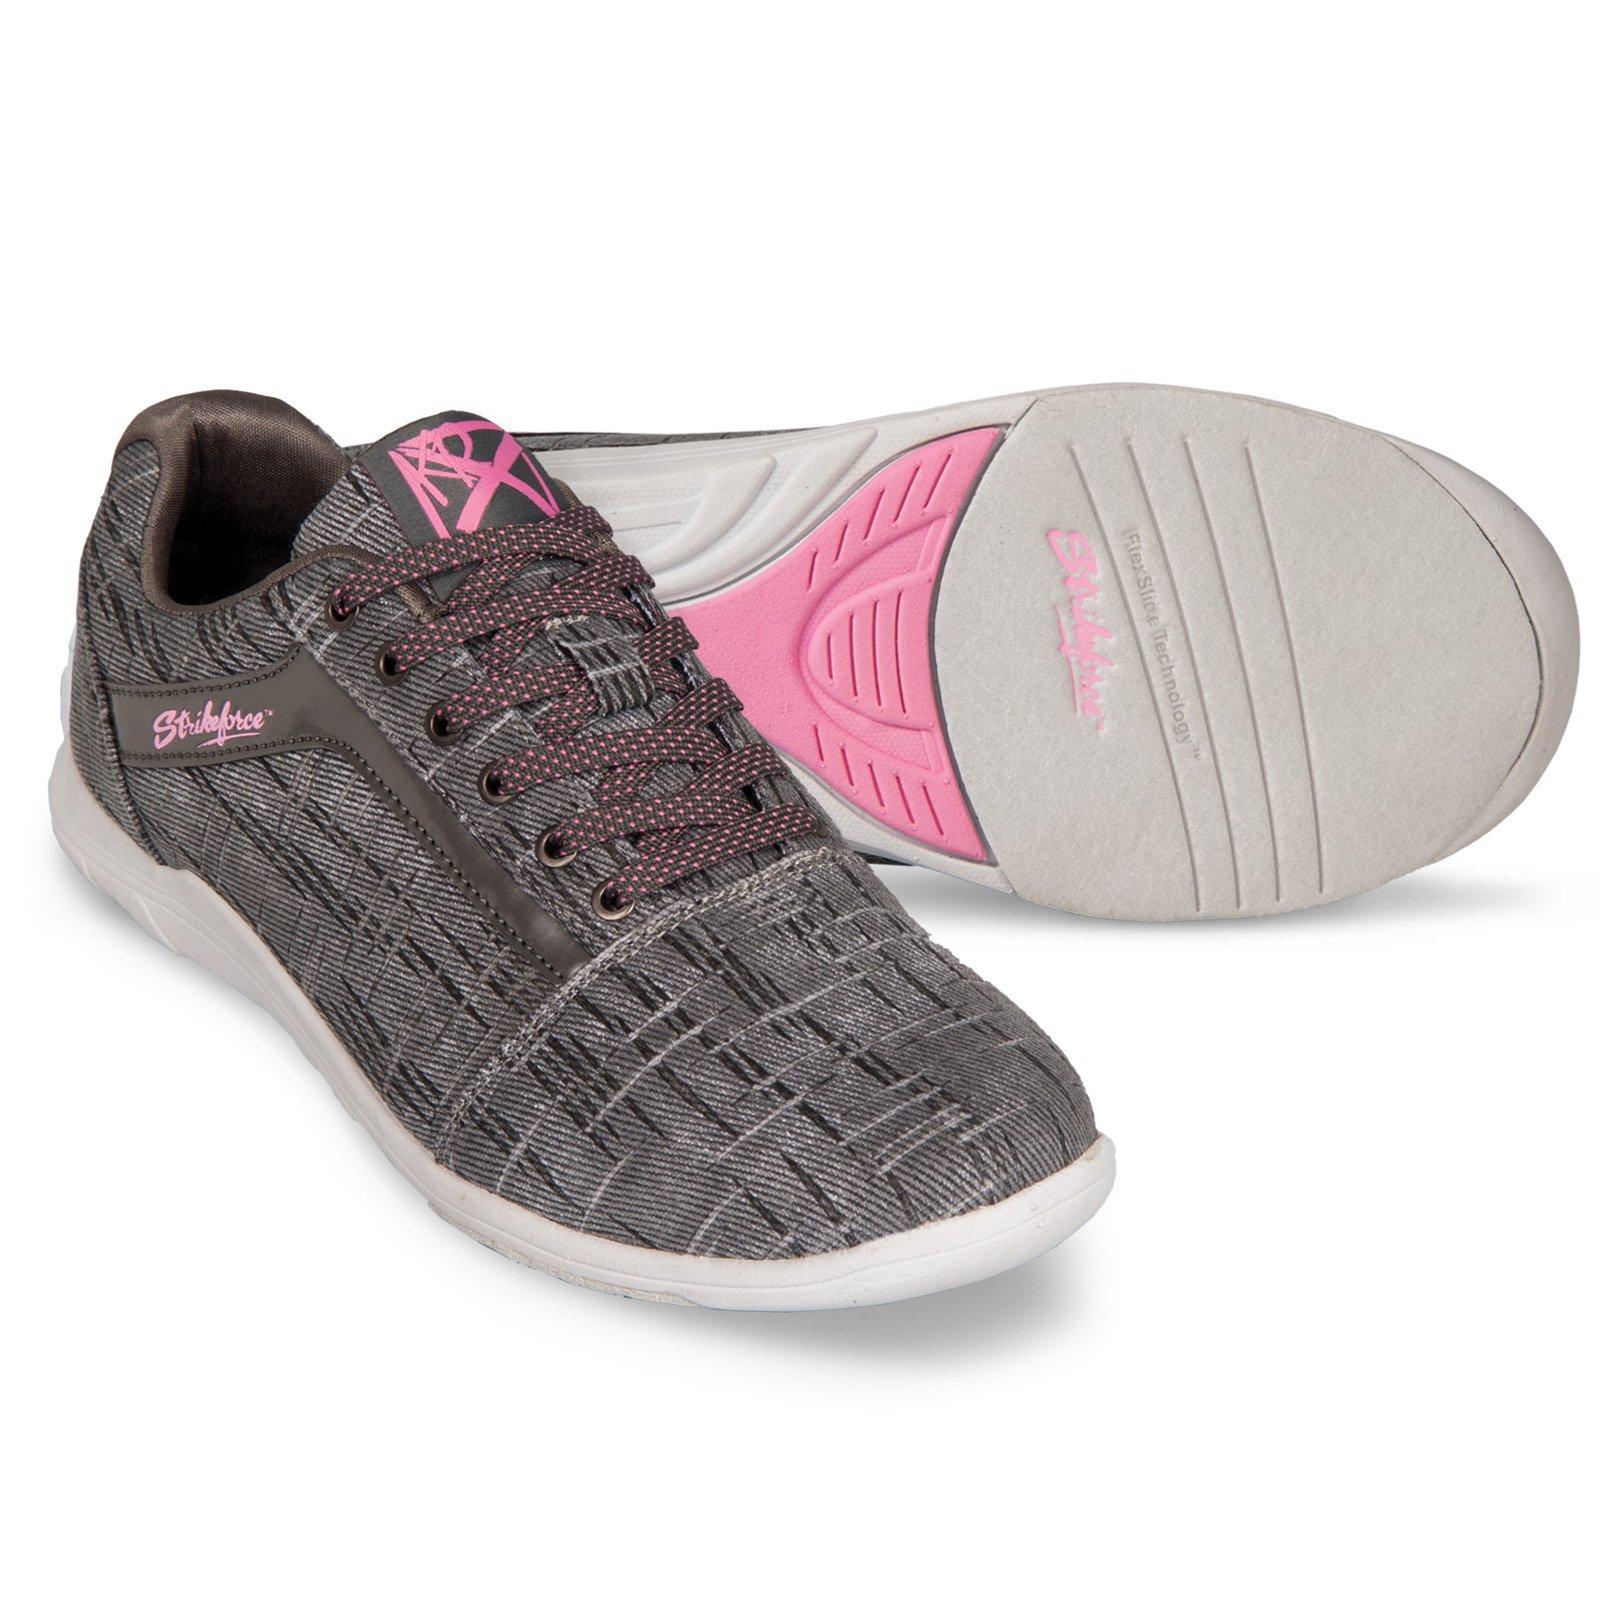 KR Nova Lite Ladies Ash/Hot Pink Wide Size 8.5 by KR Strikeforce